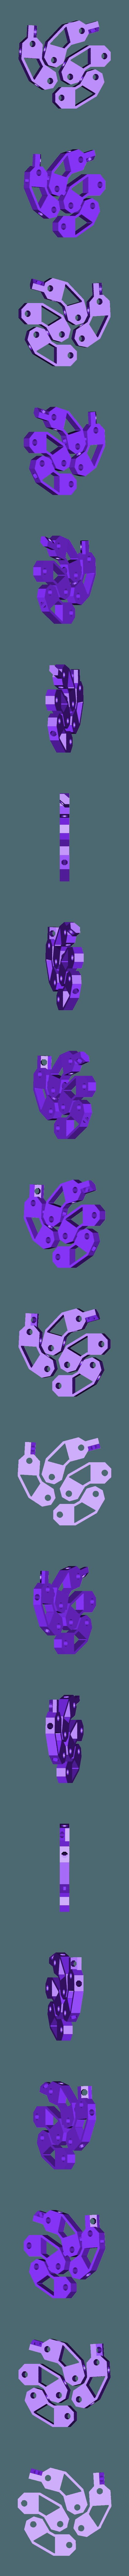 Tray-5.stl Download free STL file RepRapPro Mendel Trays • 3D printable model, Nessun_Dorma